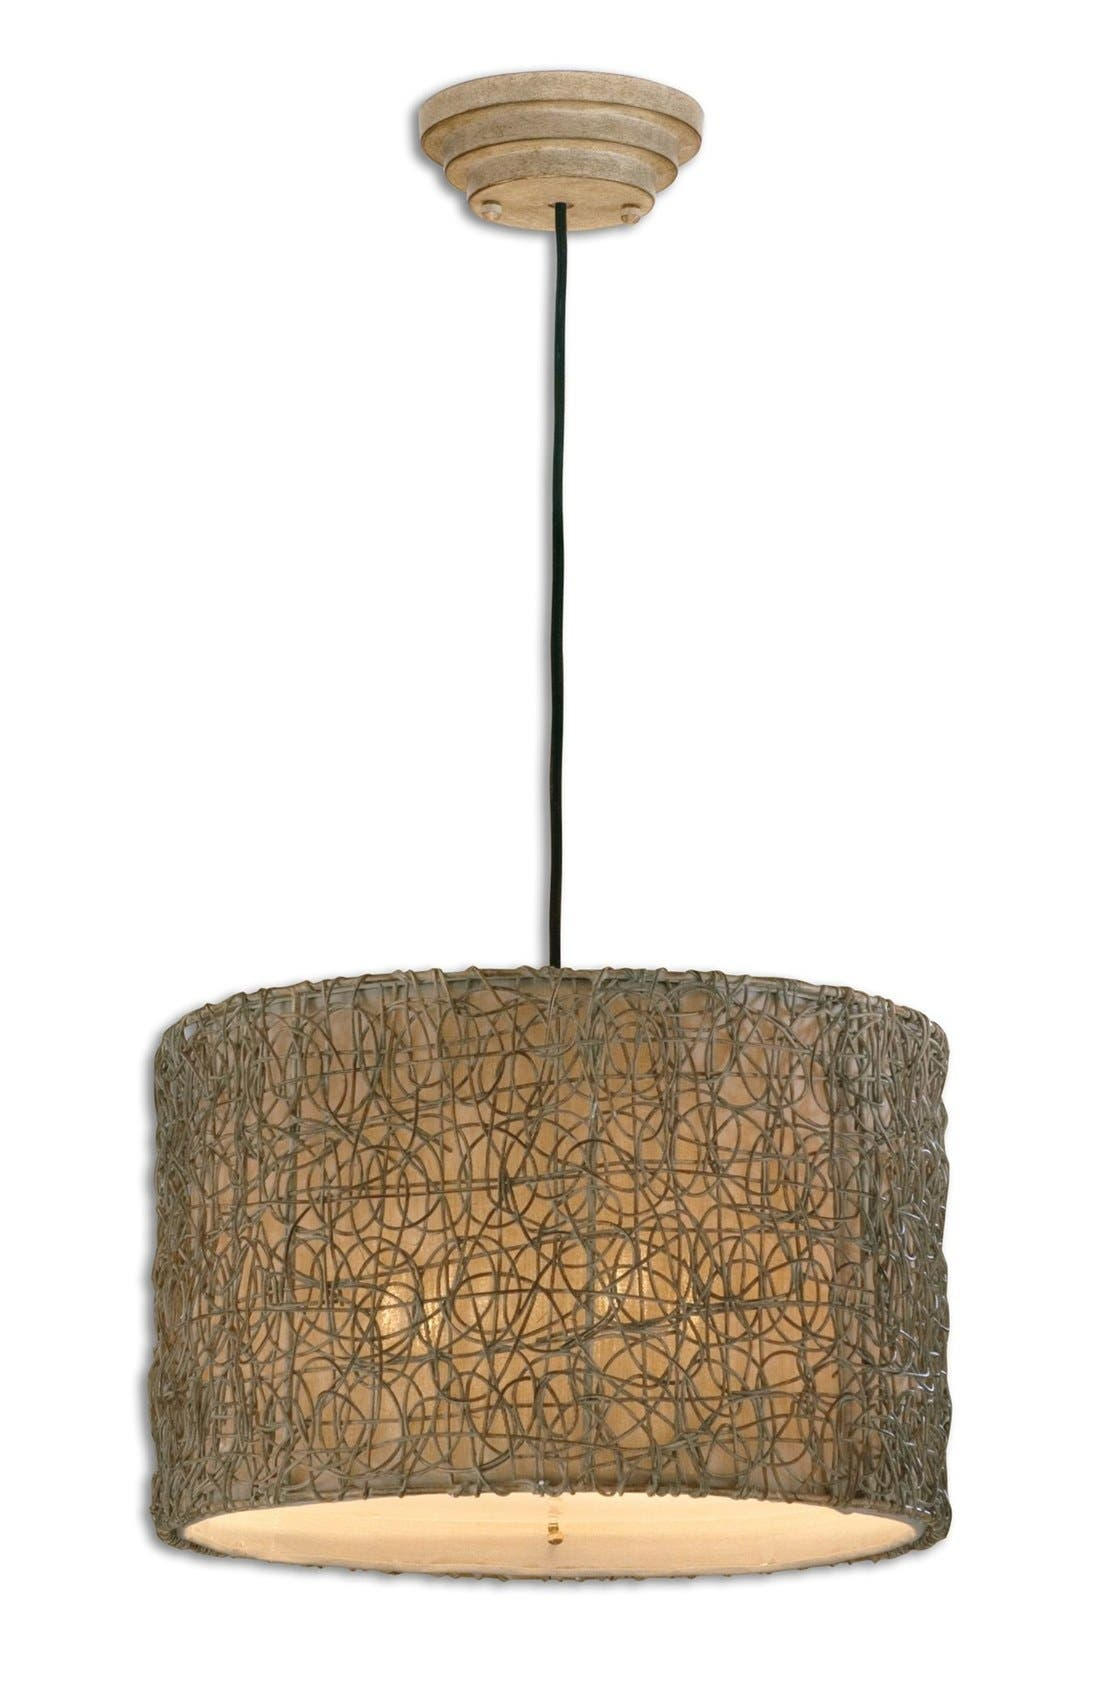 Main Image - Uttermost Knotted Rattan Pendant Light